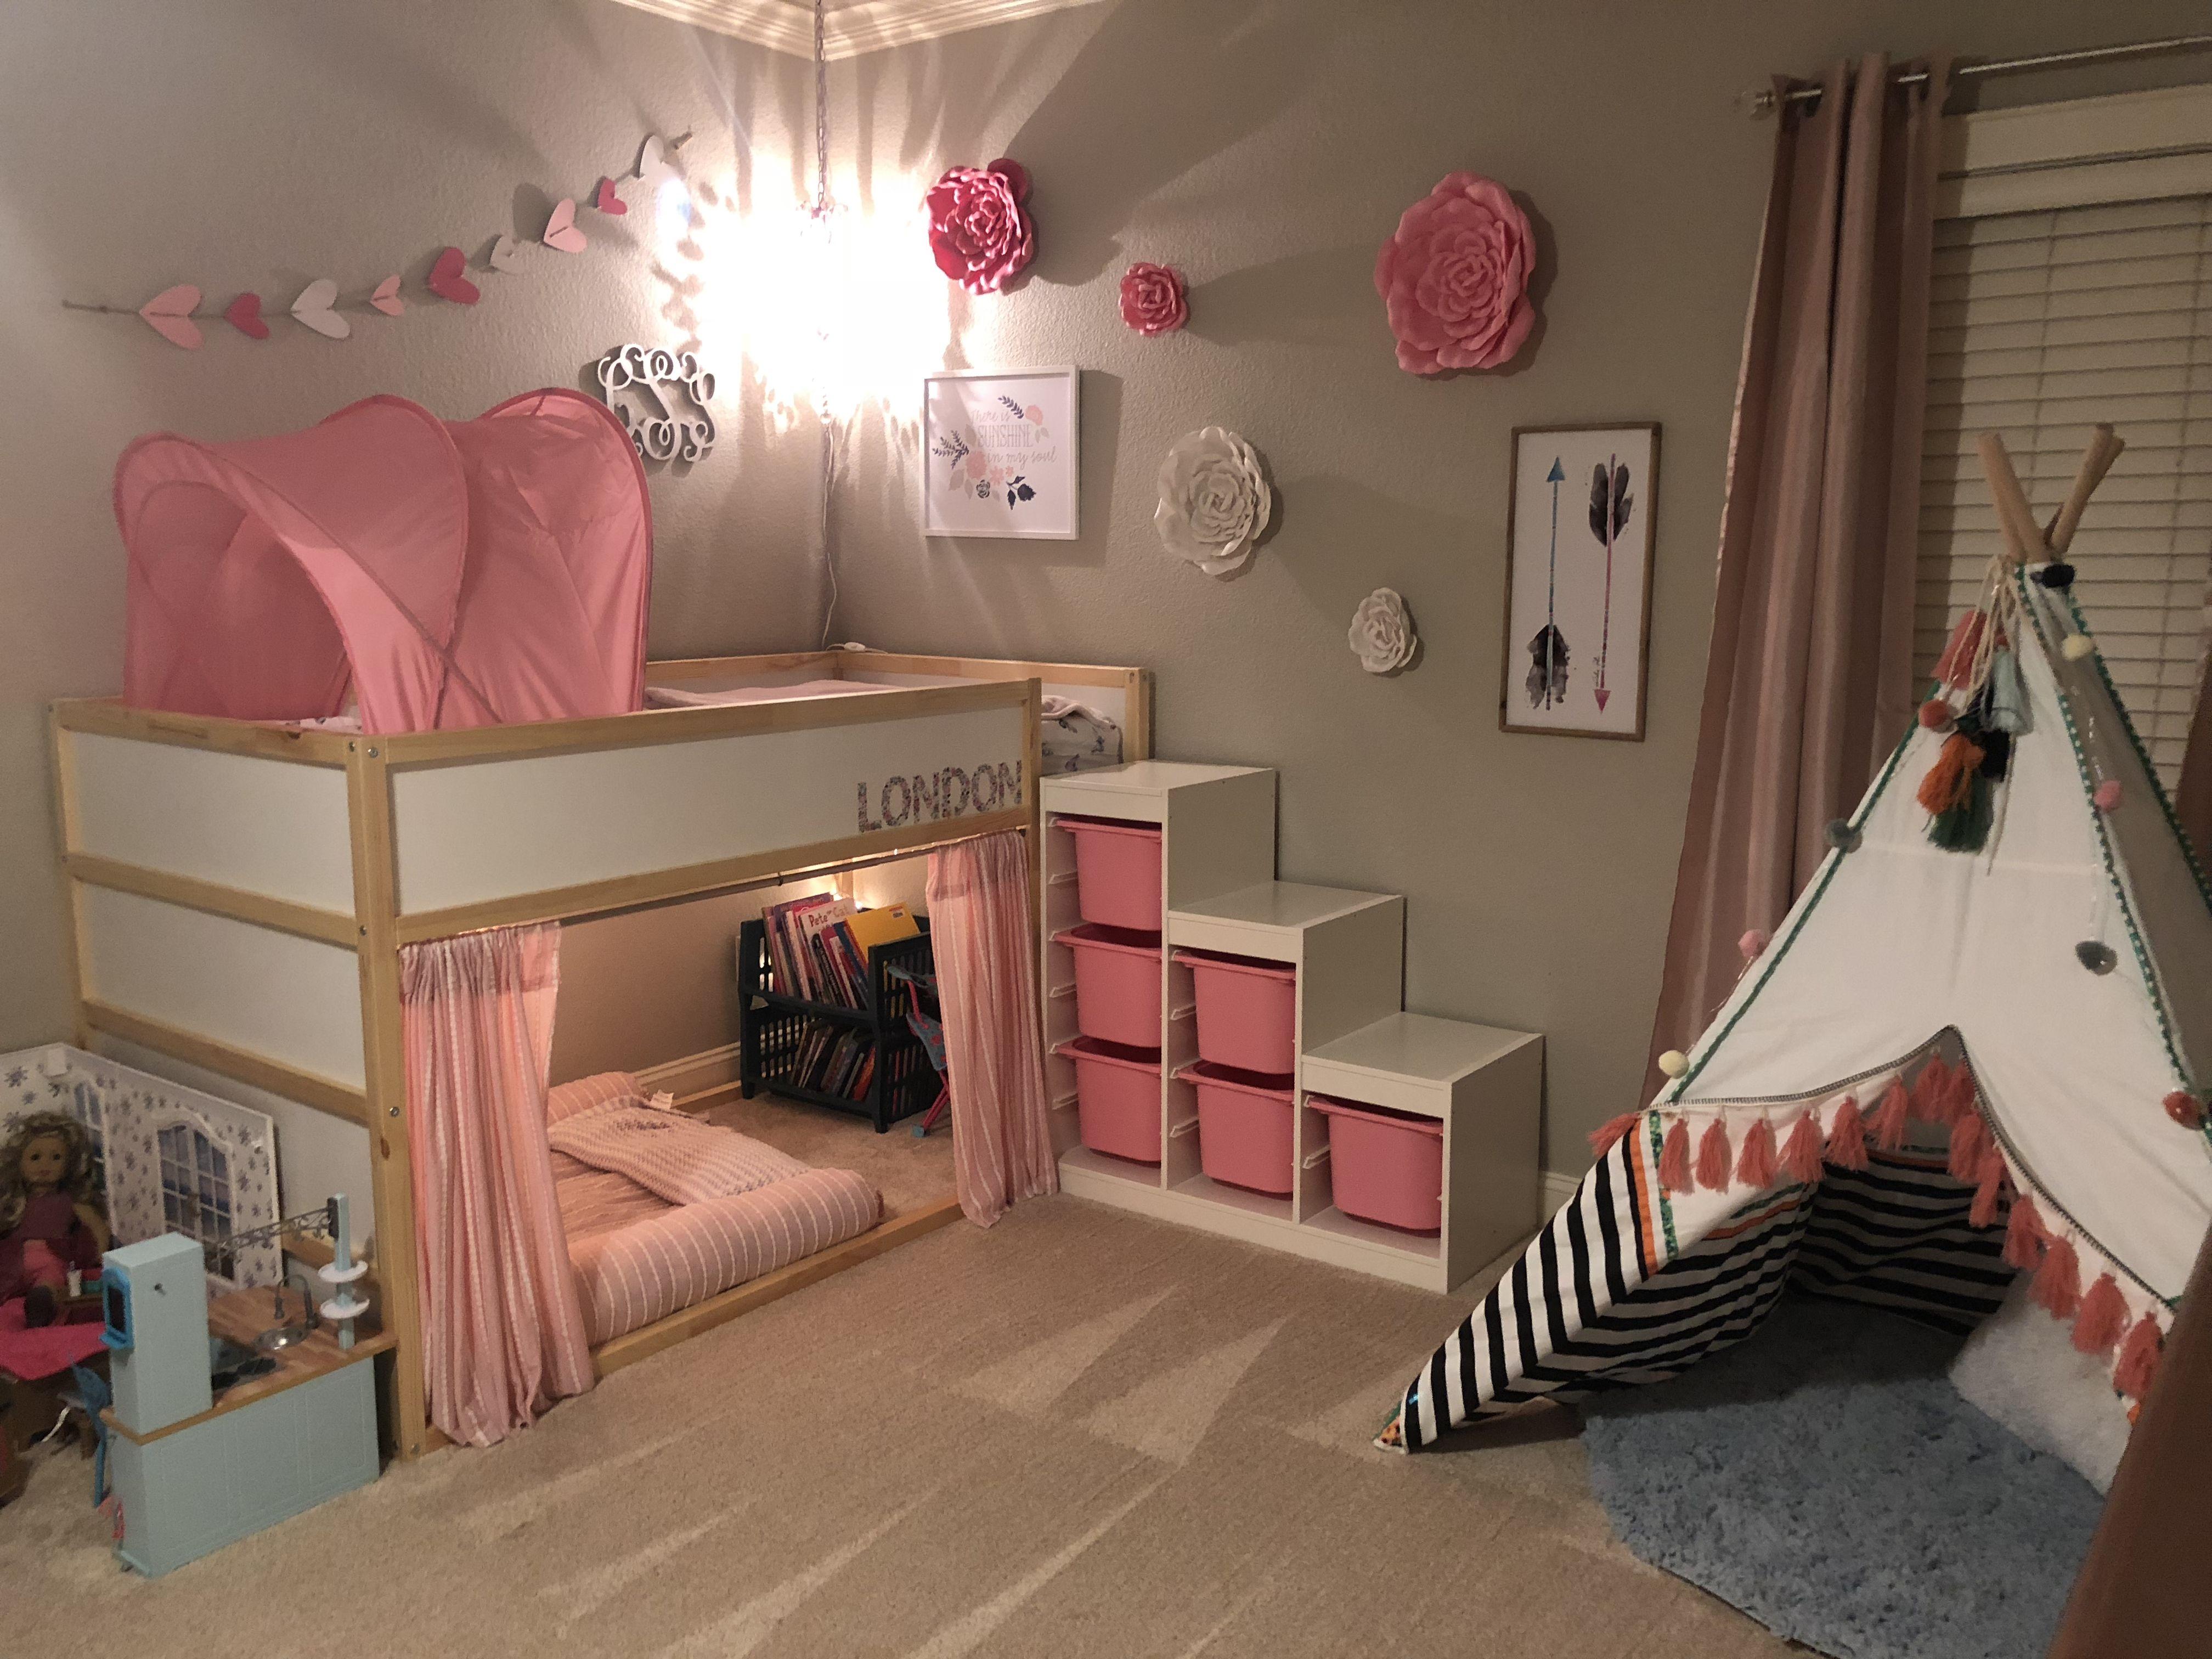 Ikea Kura Bed For London Is Finally Finished Kura Ikea Kids